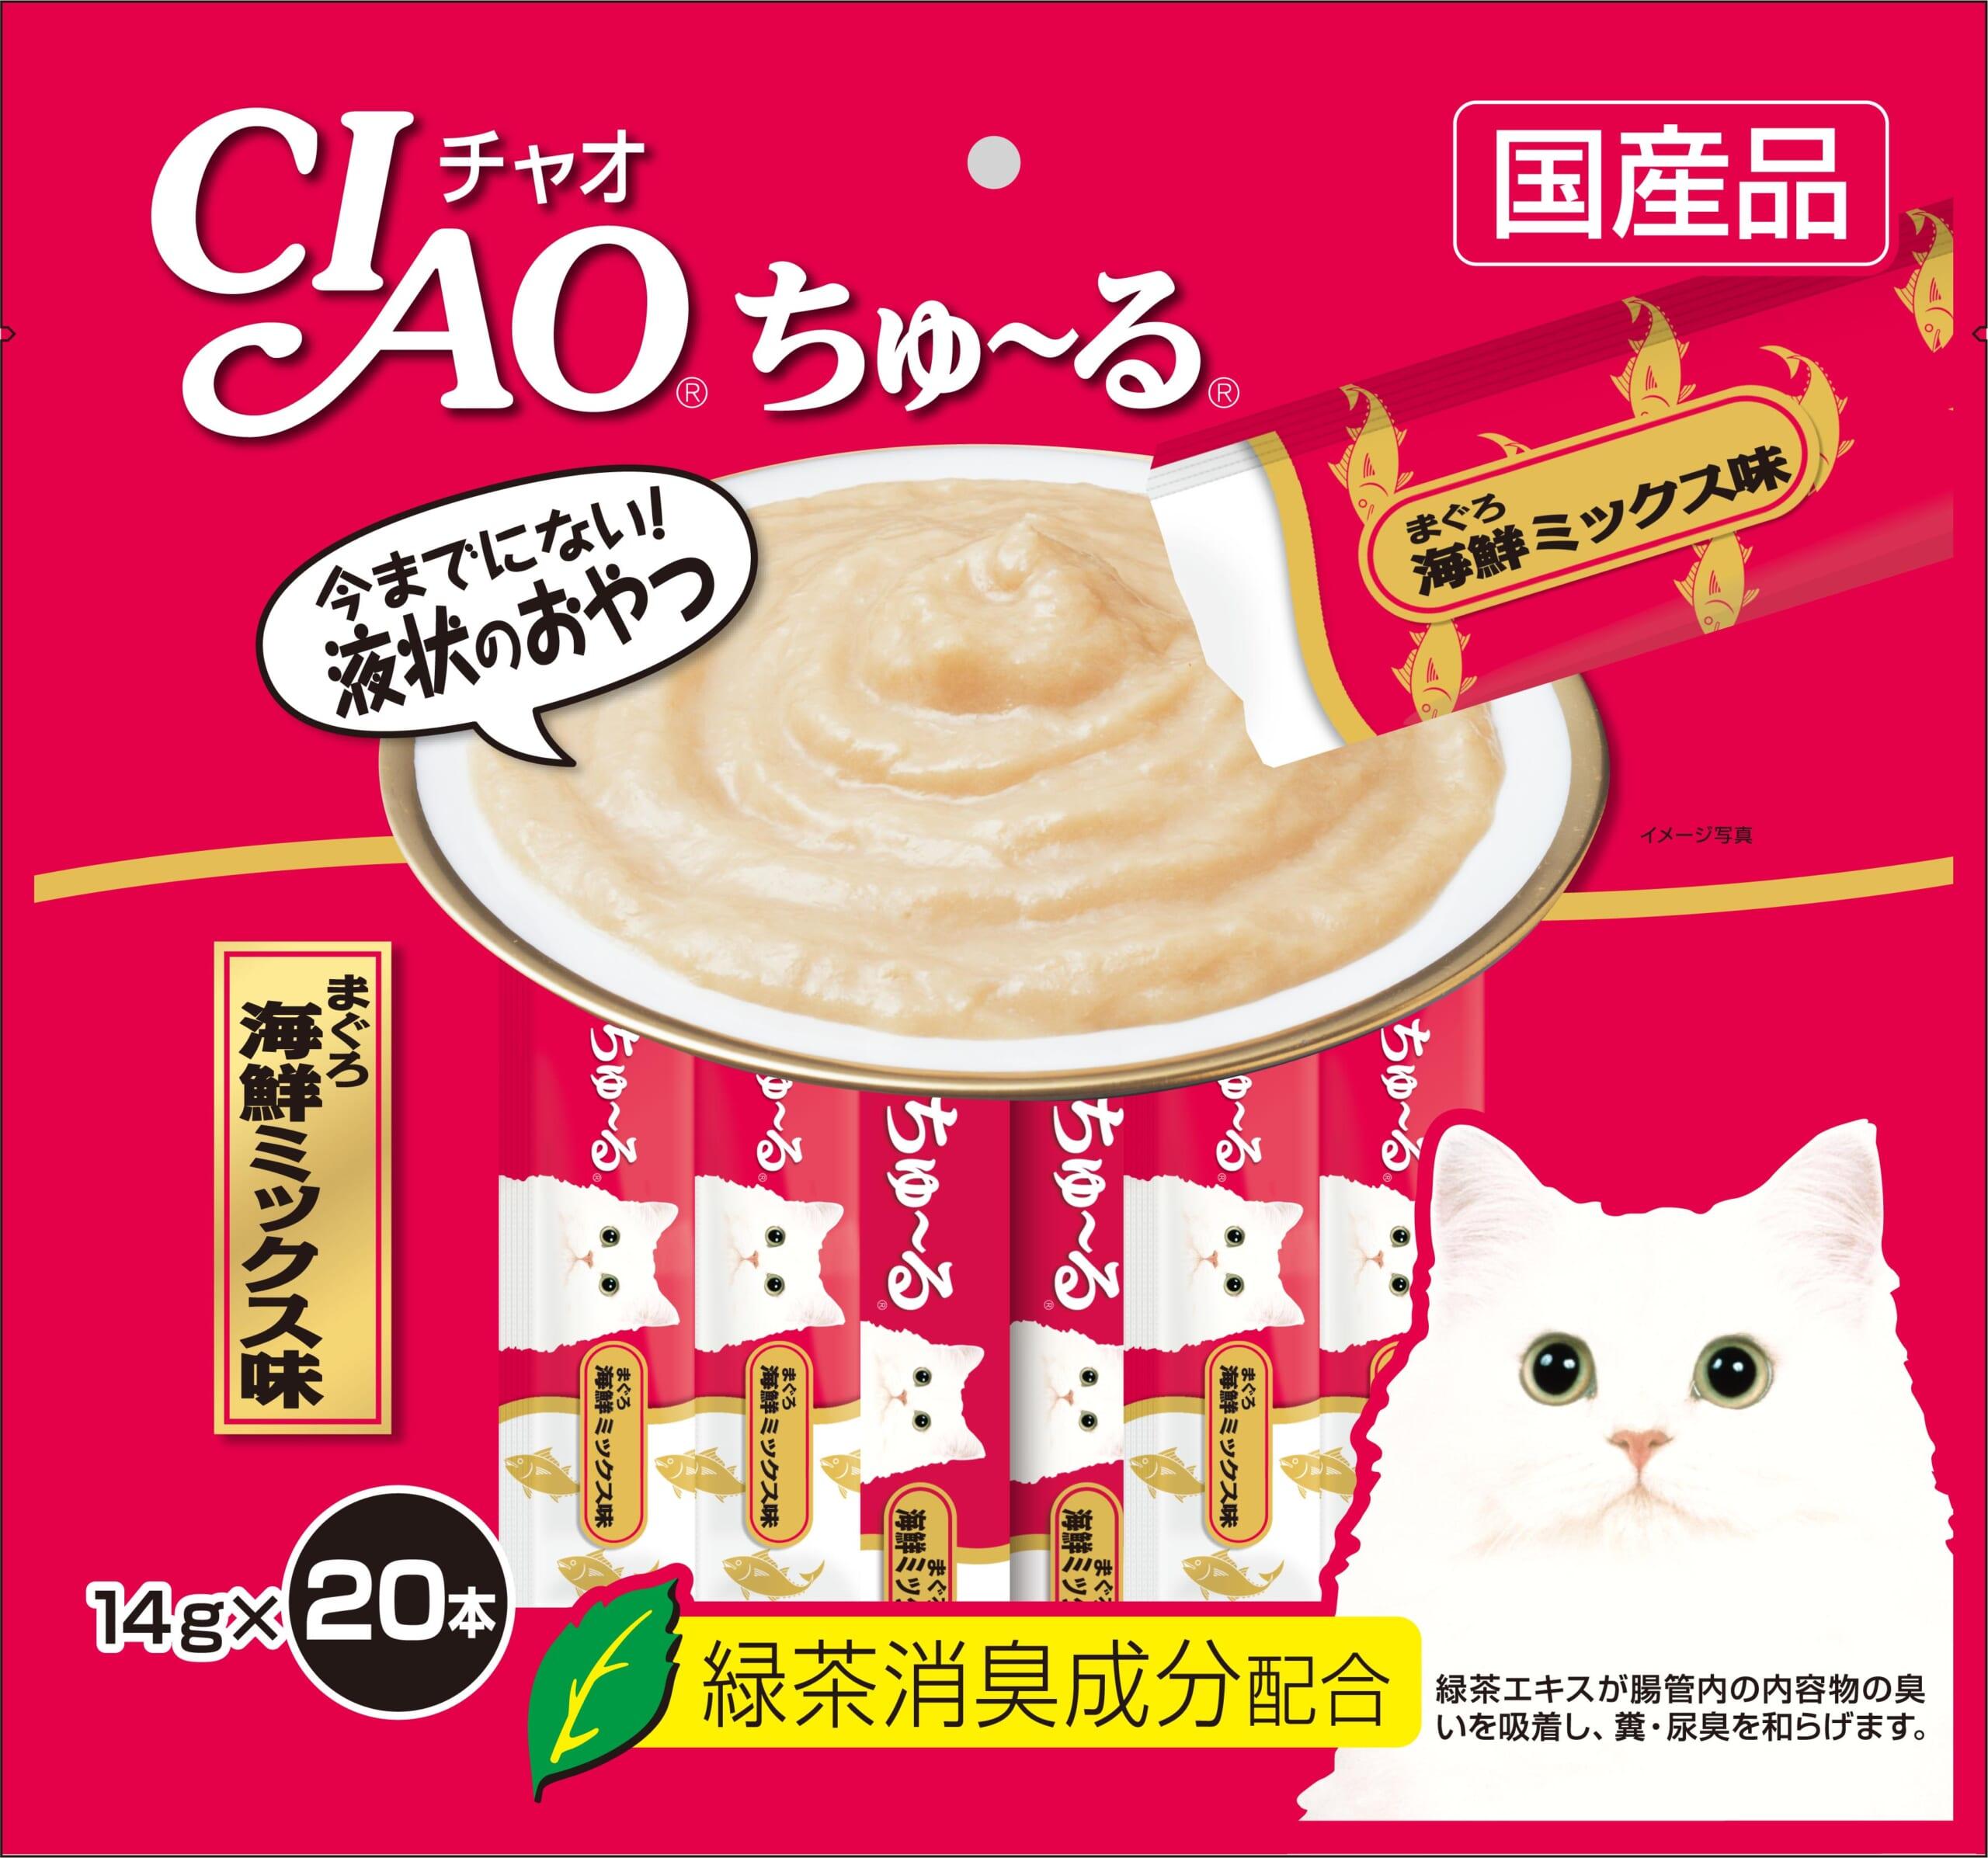 (CIAO)ちゅ〜る